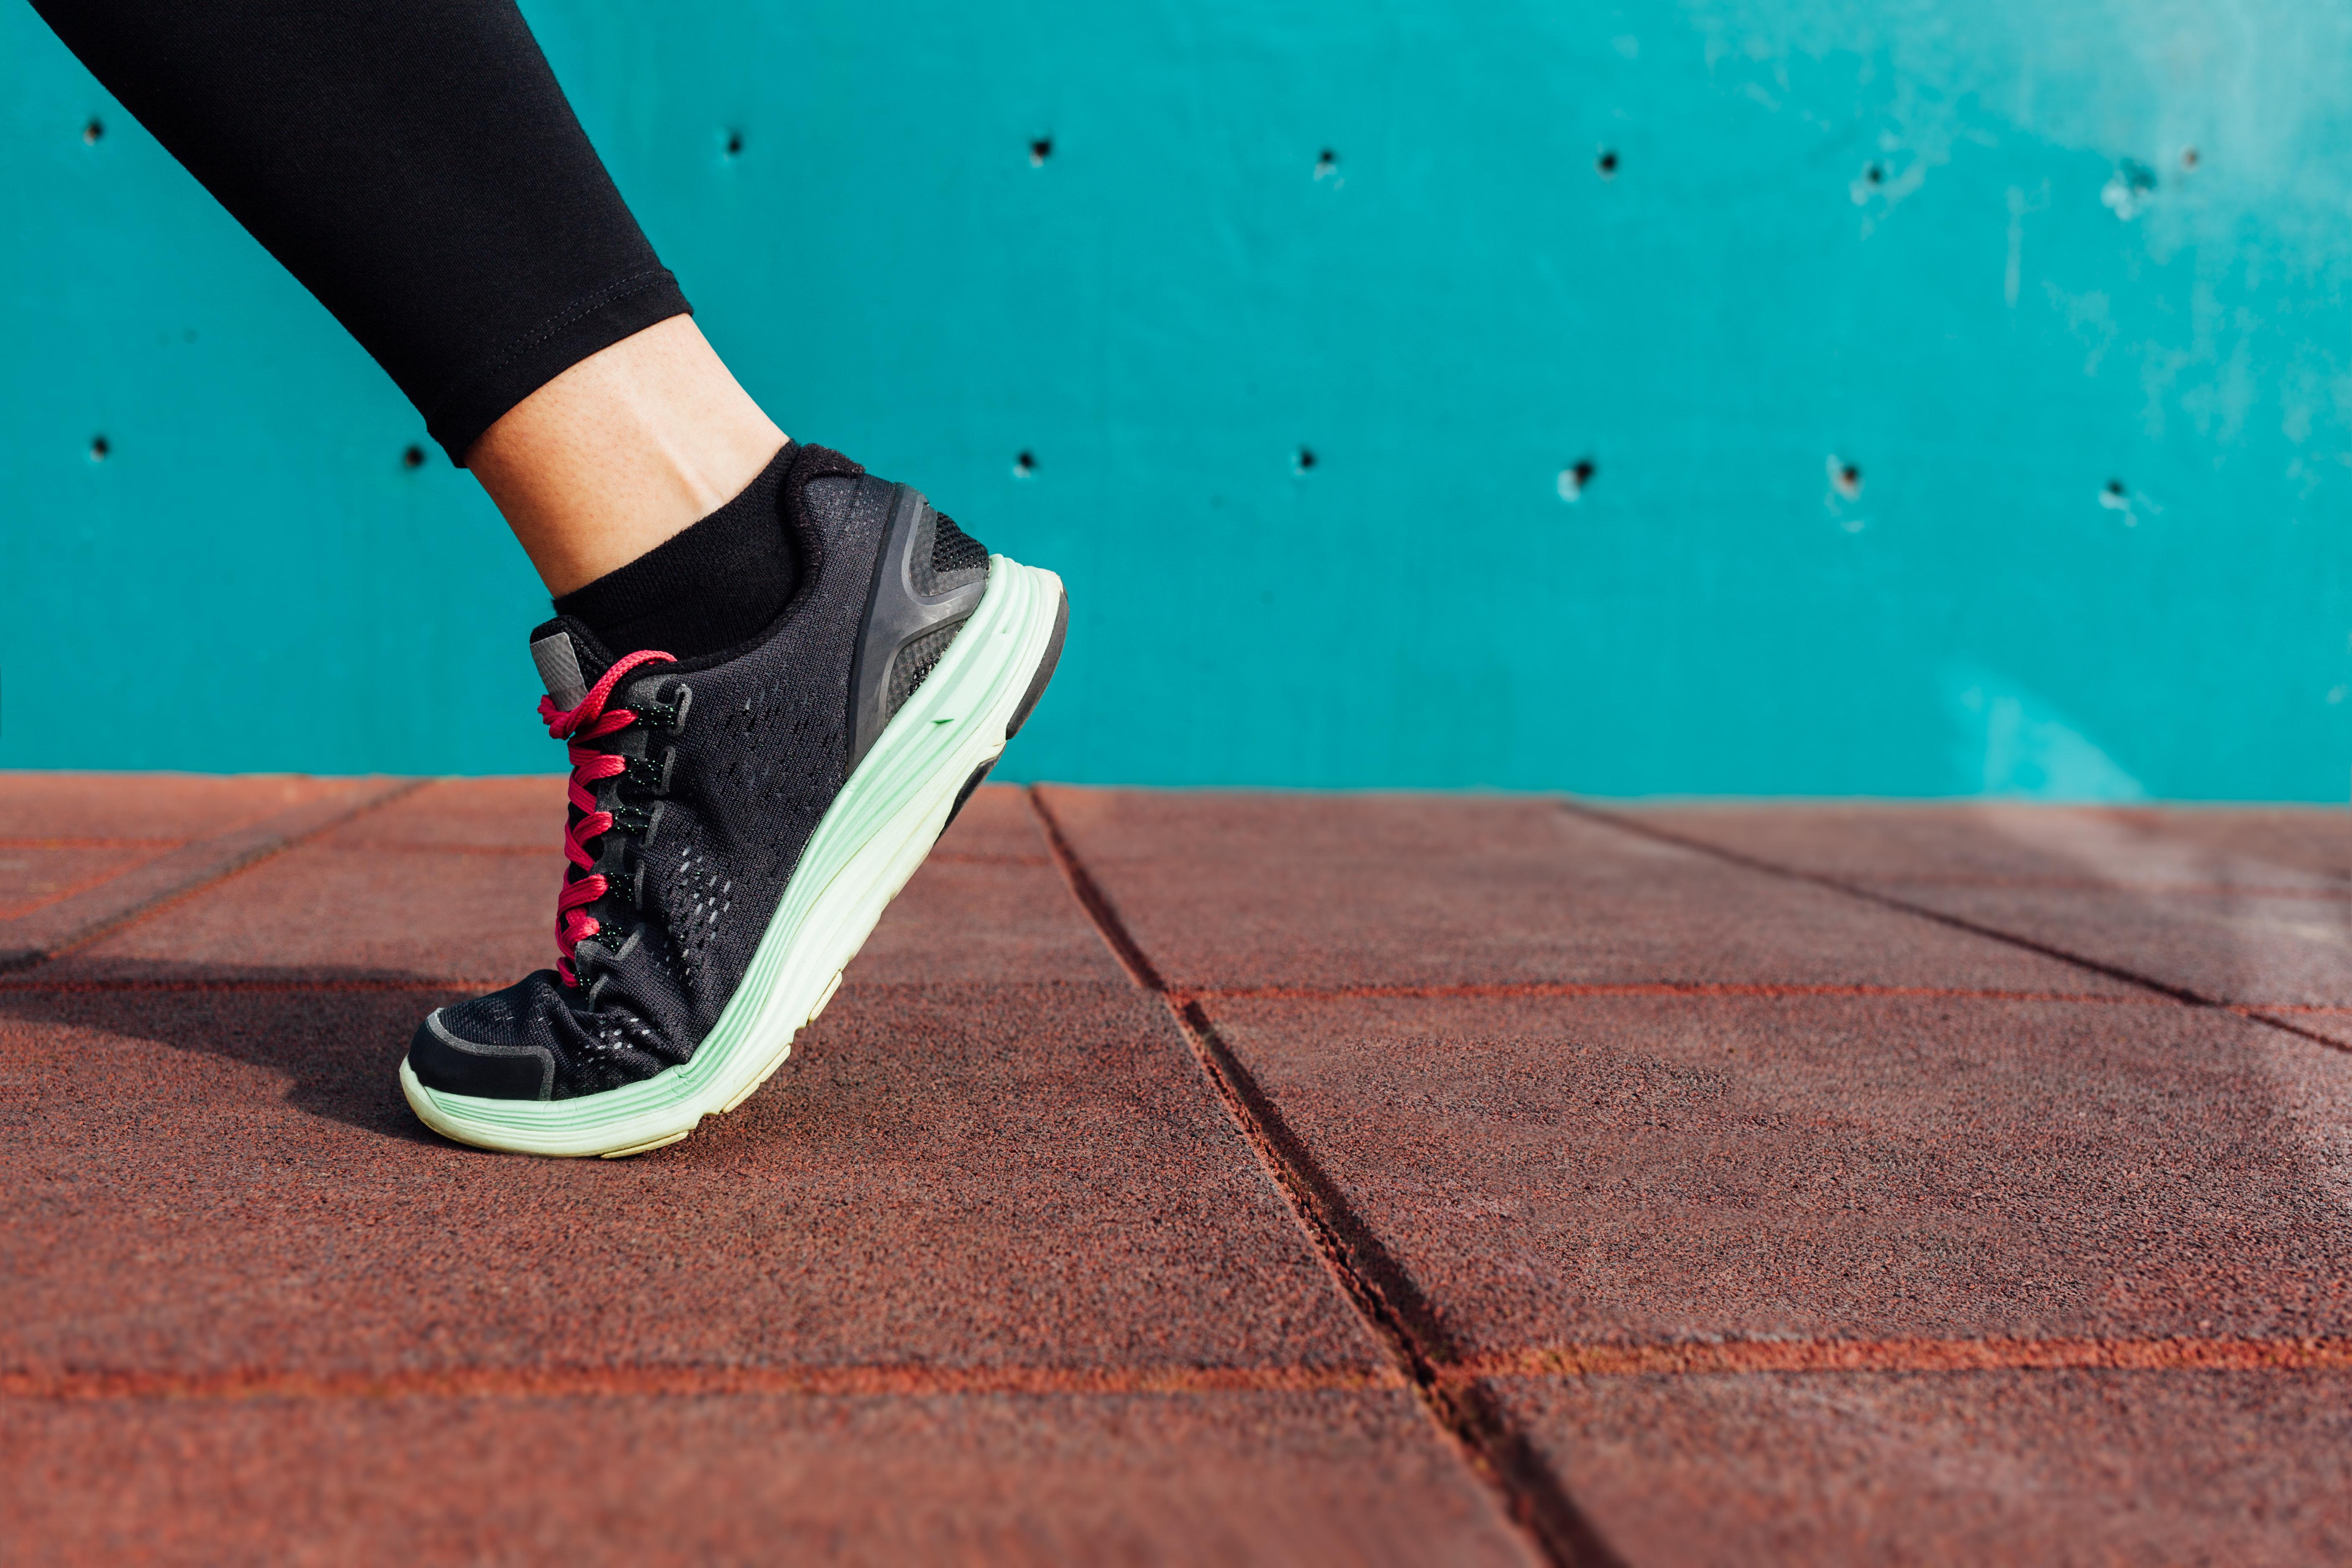 Brisk walk is better than 10,000 steps